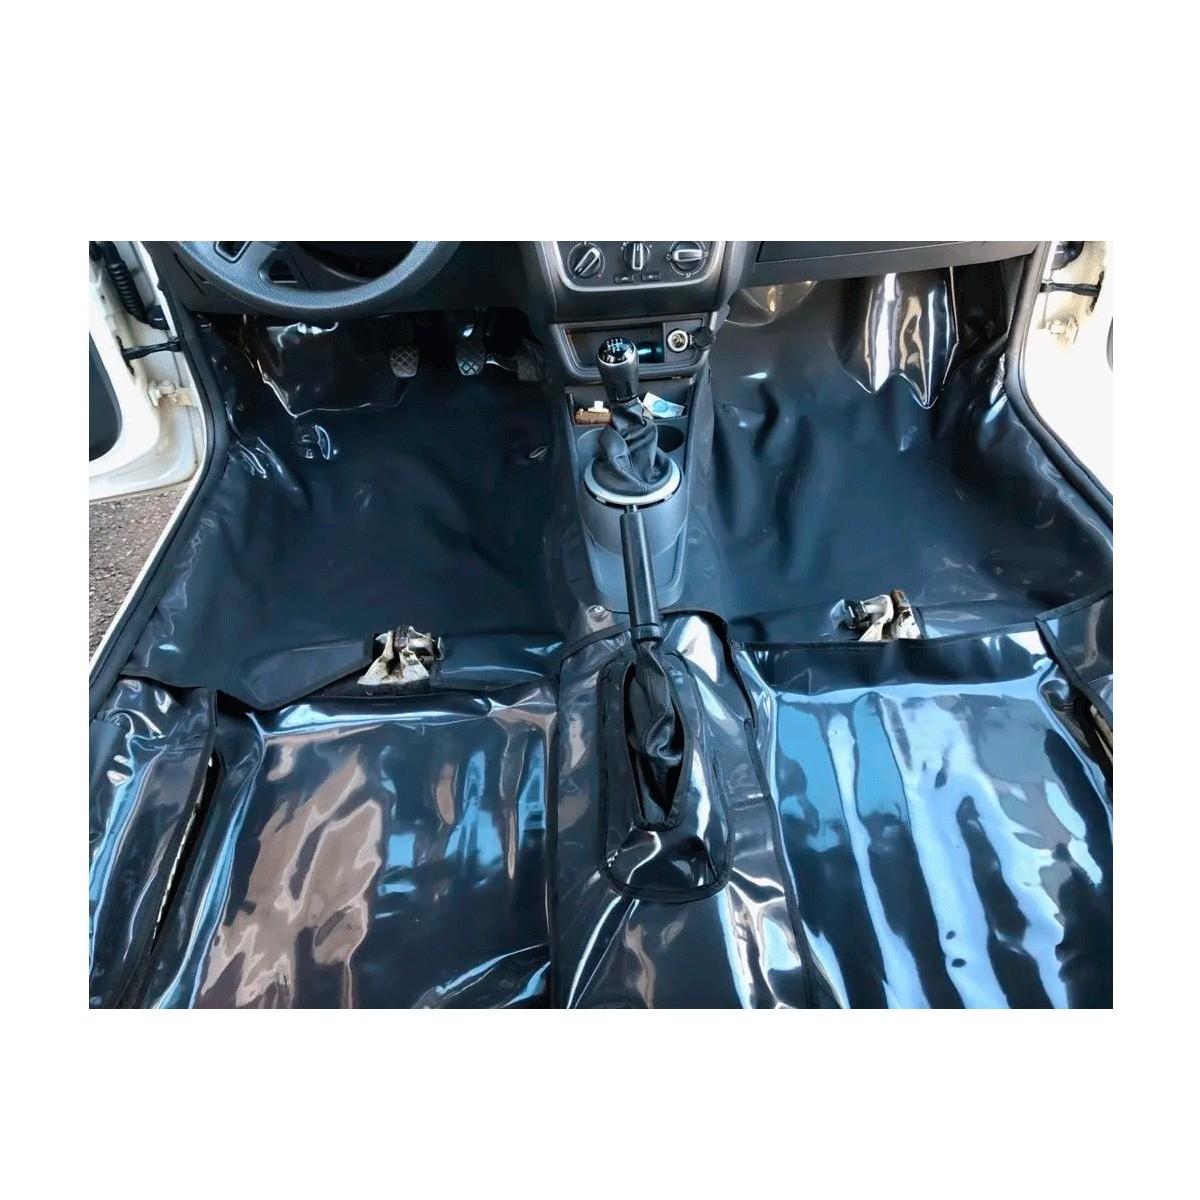 Tapete Proteção Assoalho do Renault Oroch em Vinil Verniz Impermeável